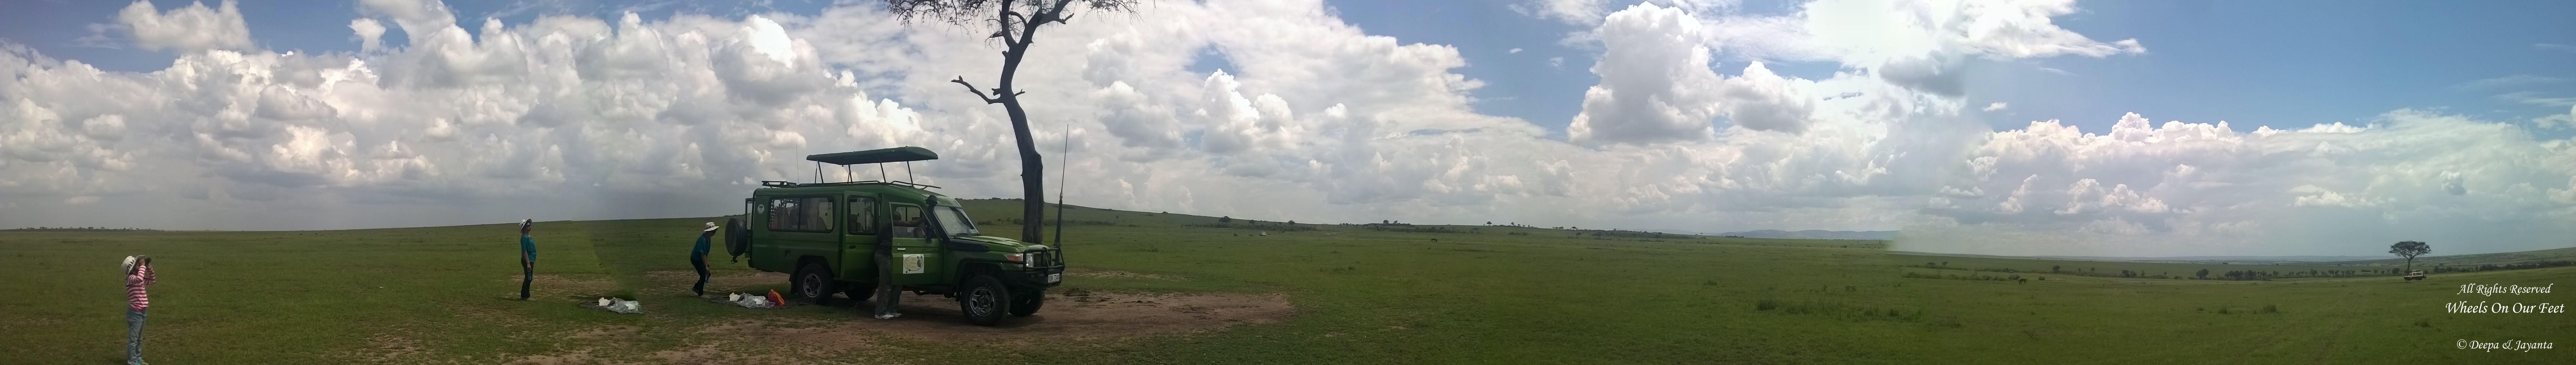 Picnic in Maasai Mara (13)